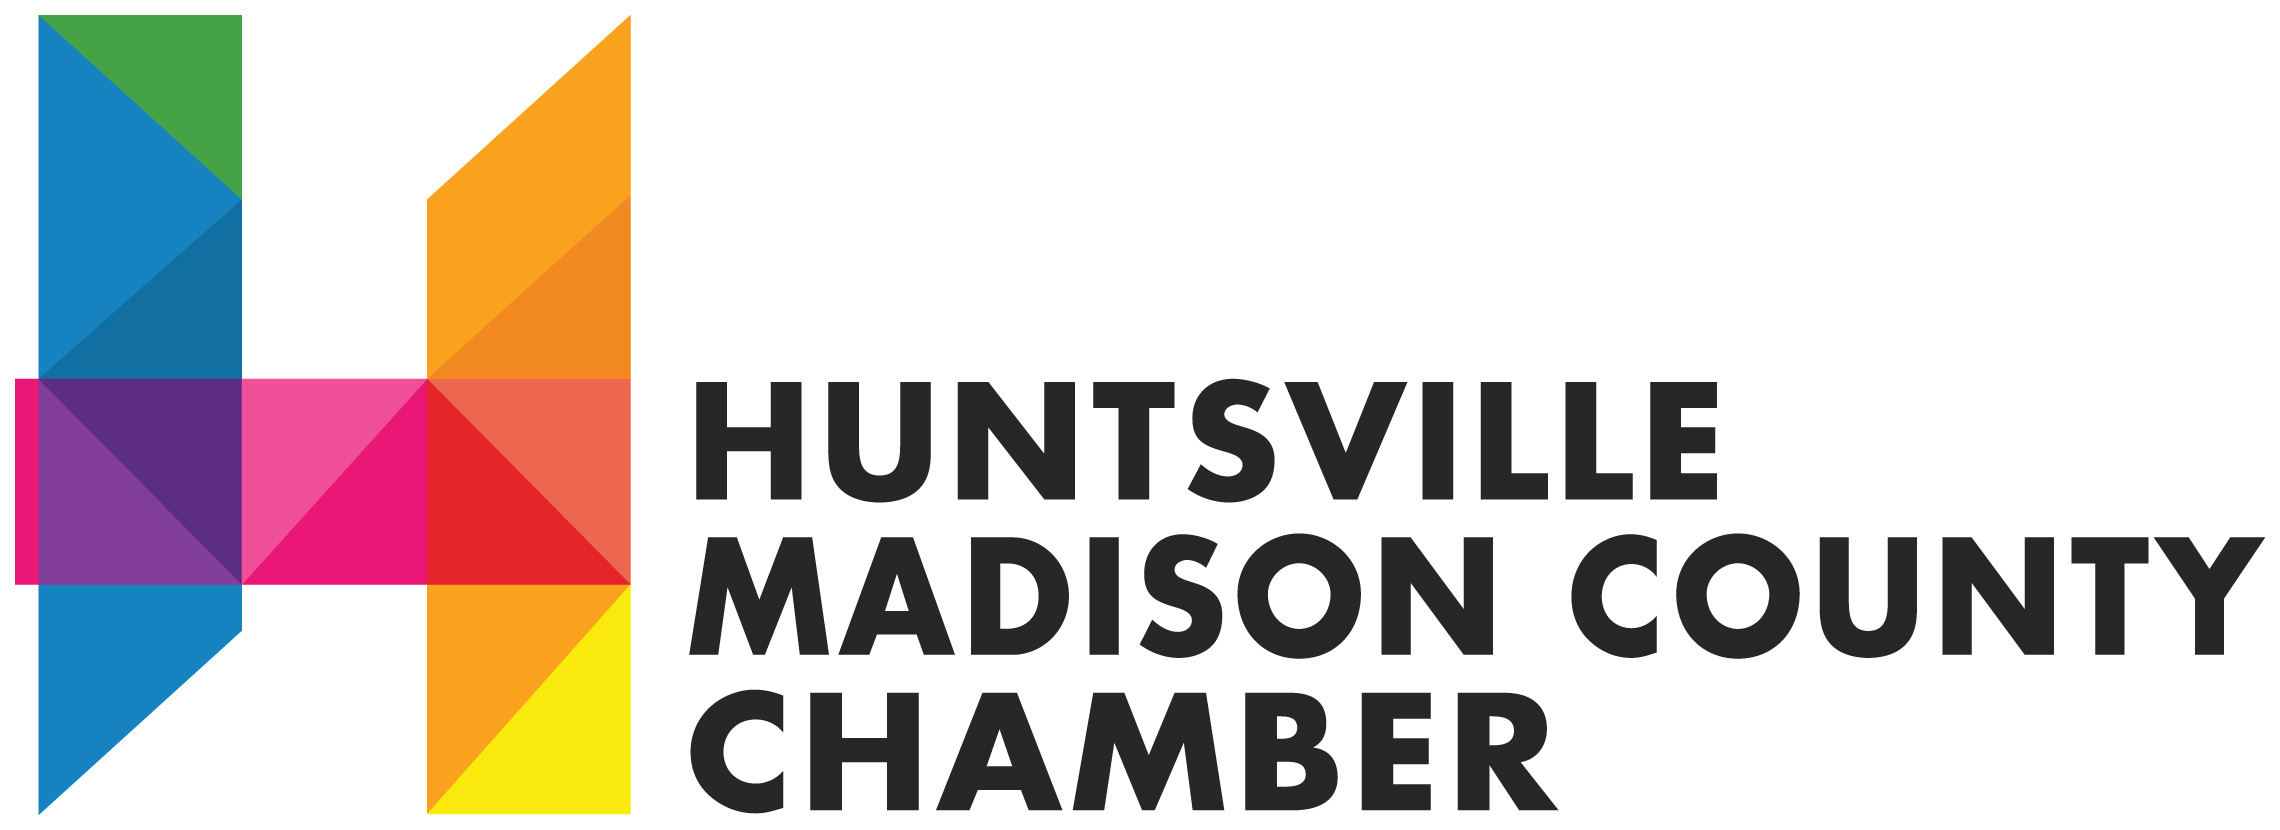 Chamber of Commerce of Huntsville/Madison County logo